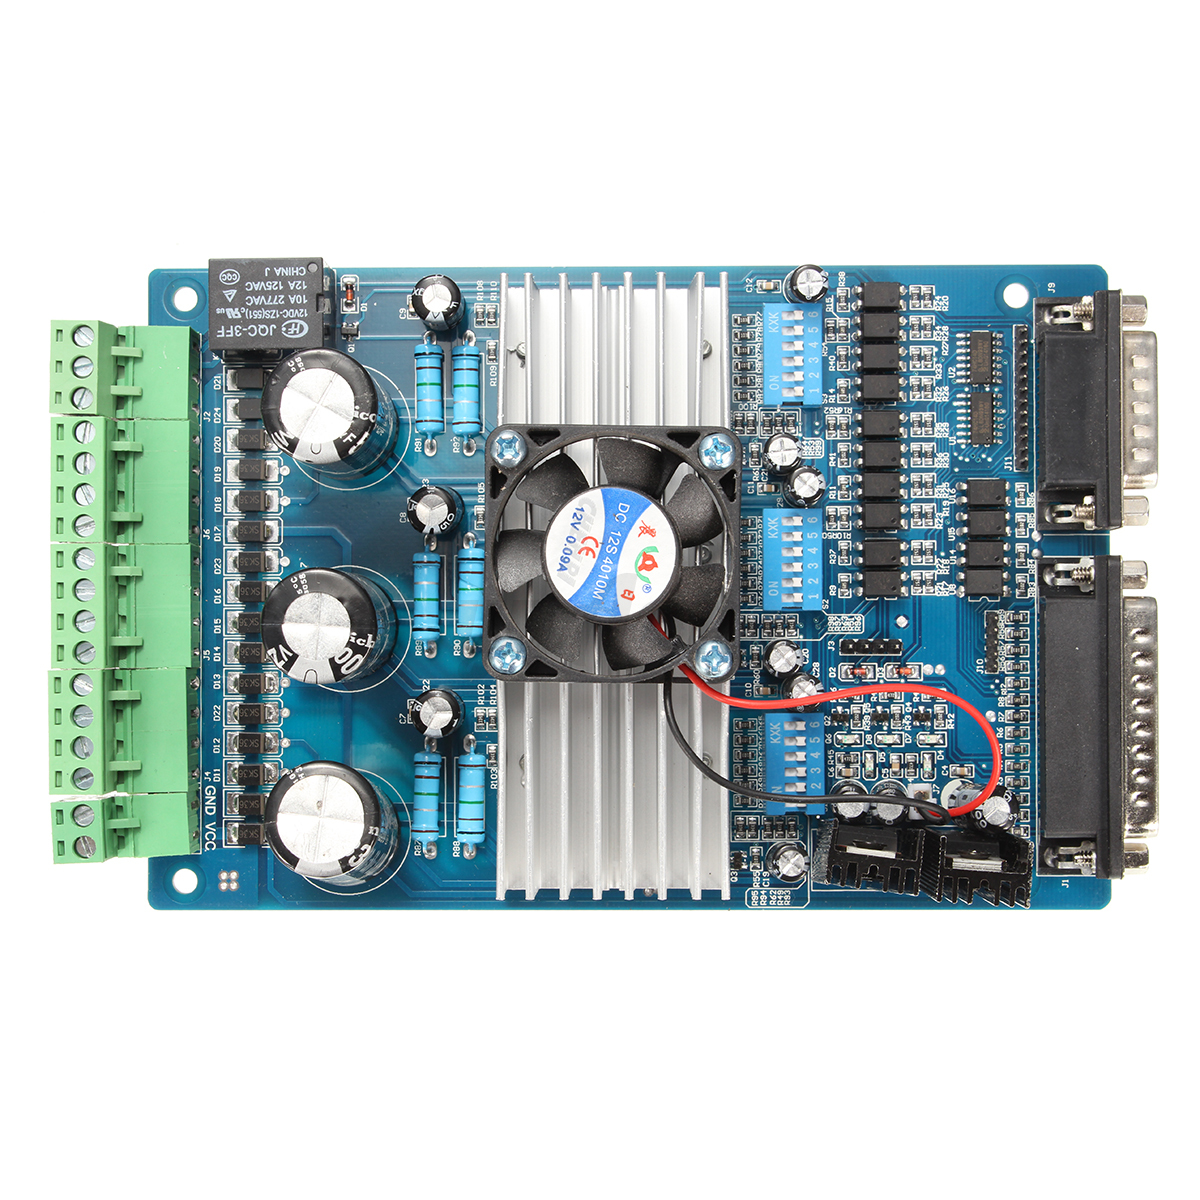 Cnc 3 axis tb6560 stepper motor driver controller board for Tb6560 stepper motor driver manual